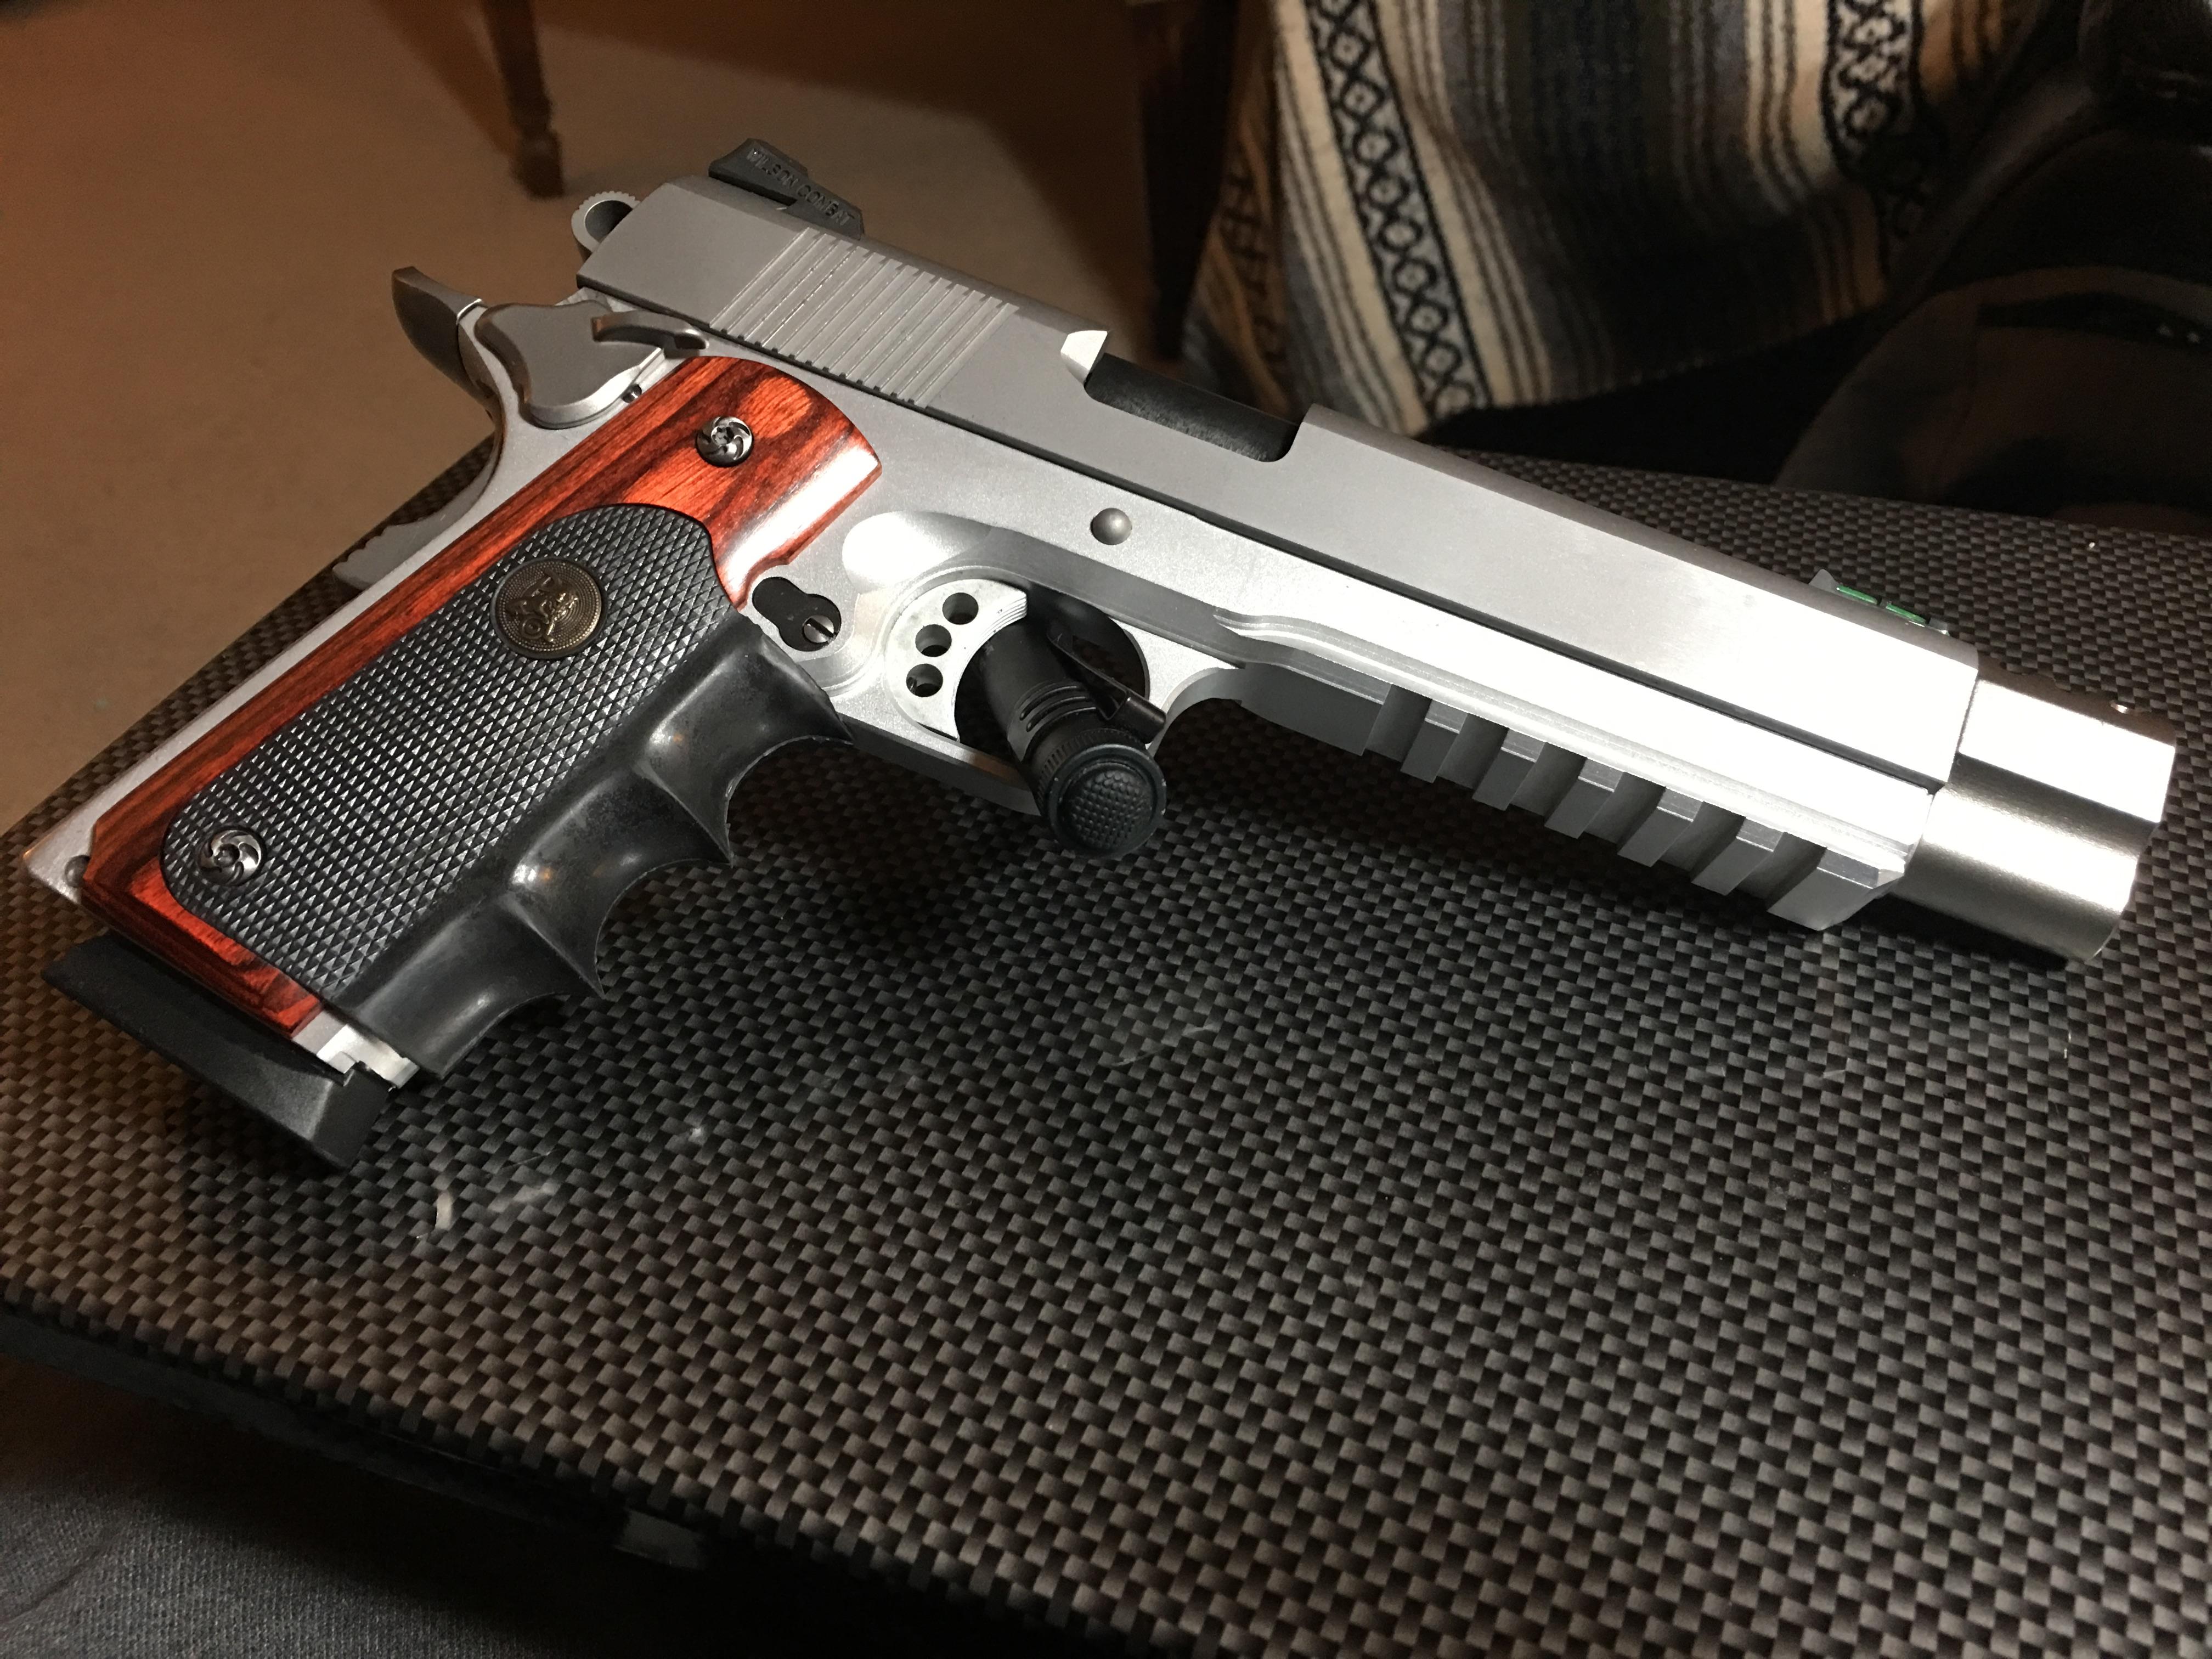 1911 80% build and range report | Gun and Game - The Friendliest Gun ...